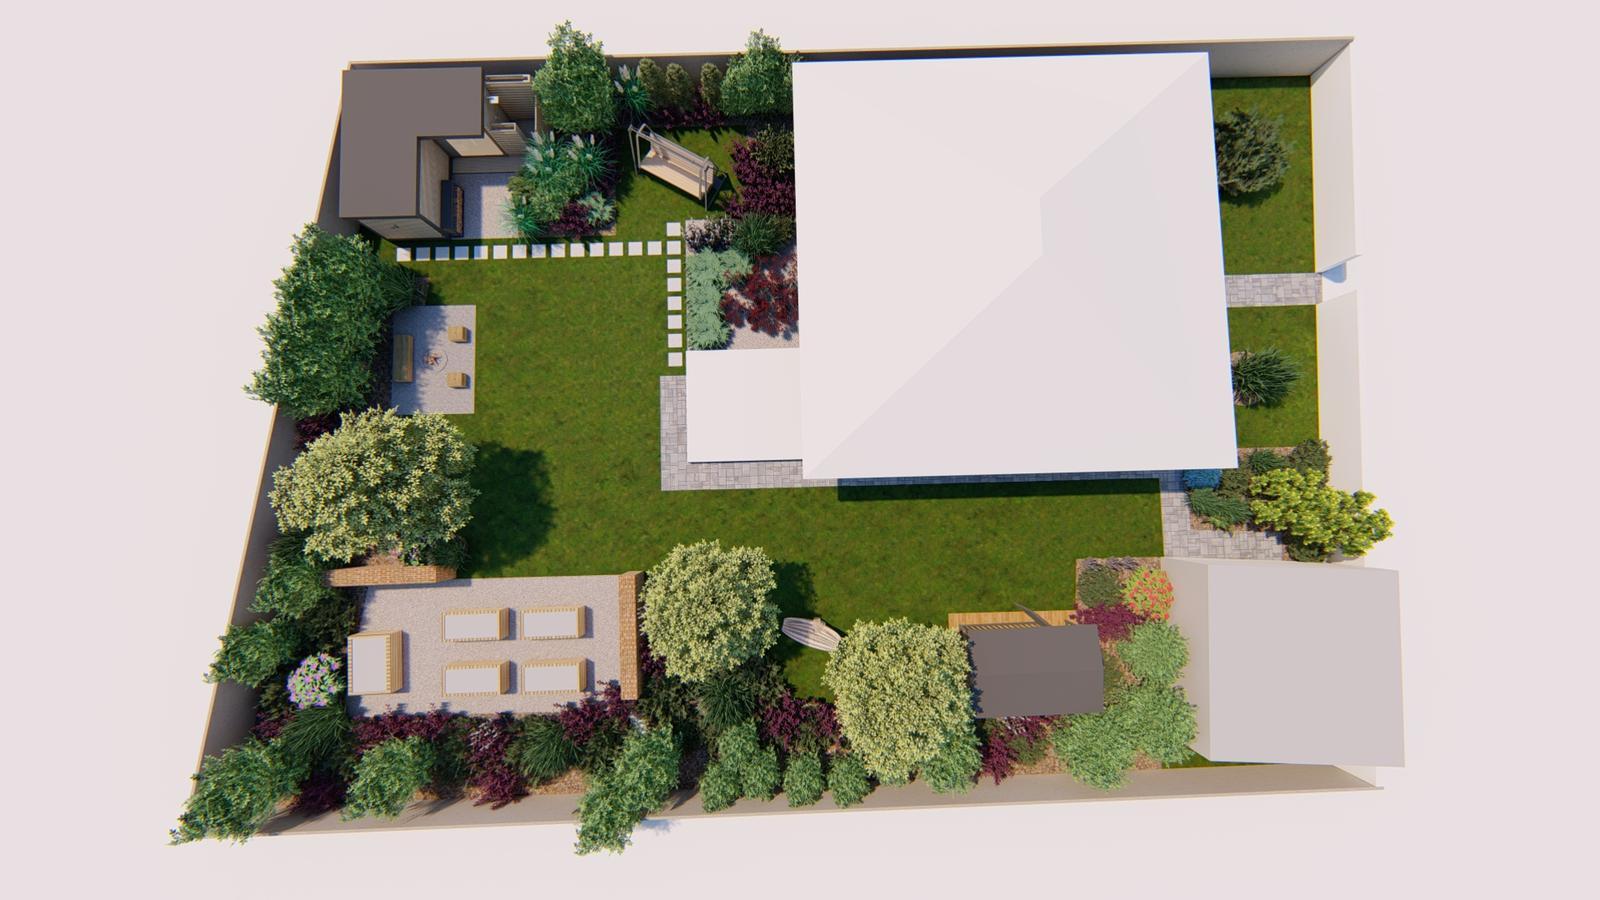 Návrh záhrady rodinného domu - Obrázok č. 23